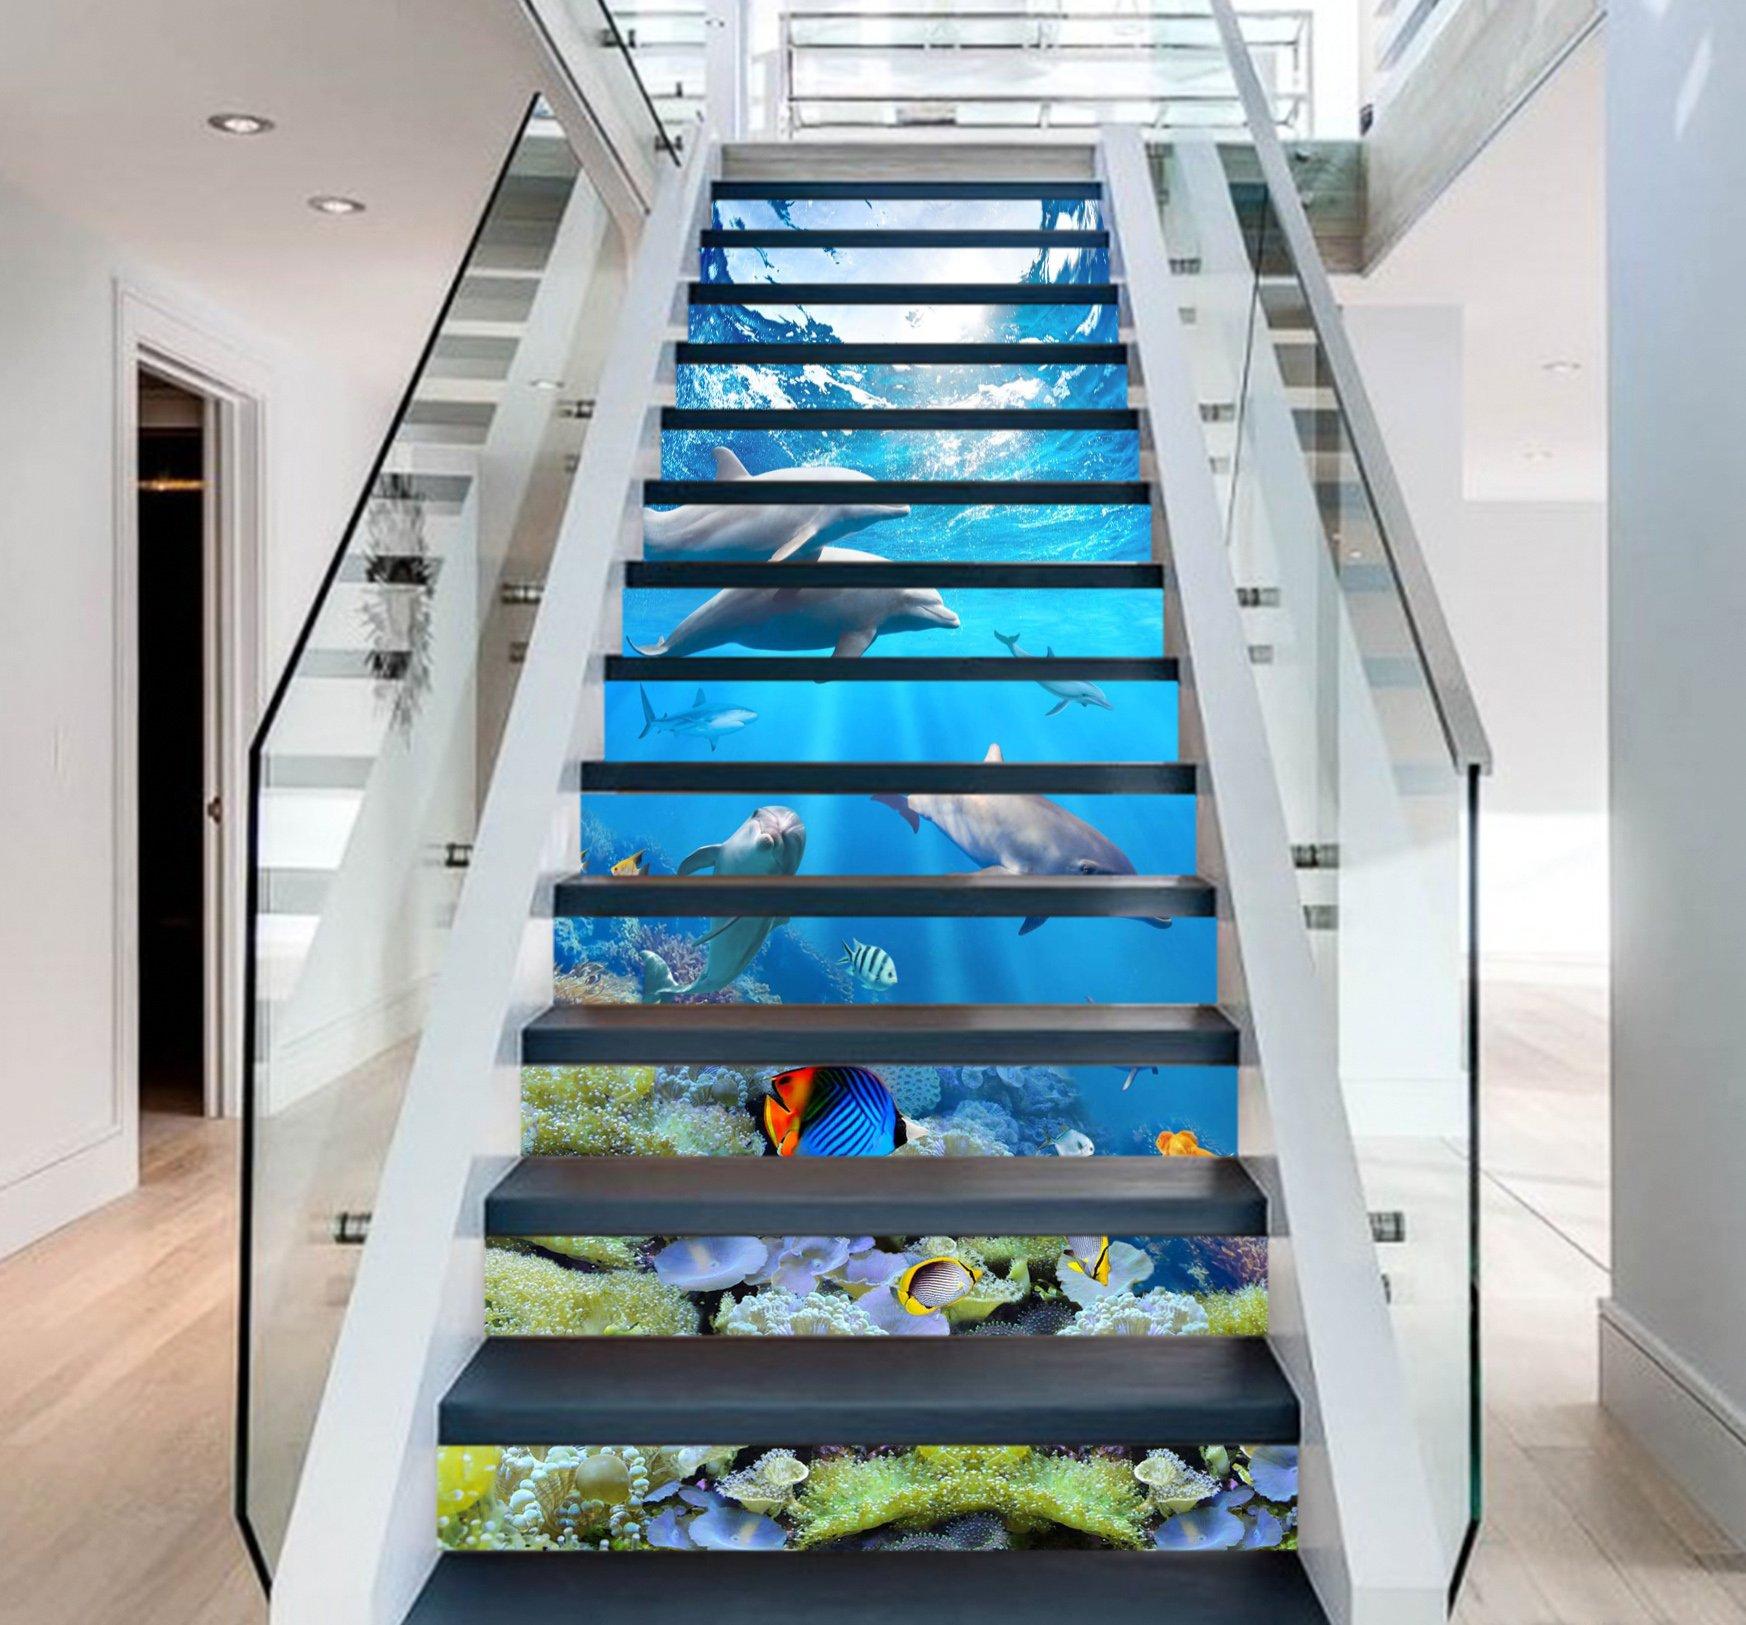 3D Dolphin Ocean View 6411 Stair Risers Decoration Photo Mural Vinyl Decal Wallpaper Murals Wallpaper Mural US Lemon (15x H:18cm x W:94cm (7''x37''))